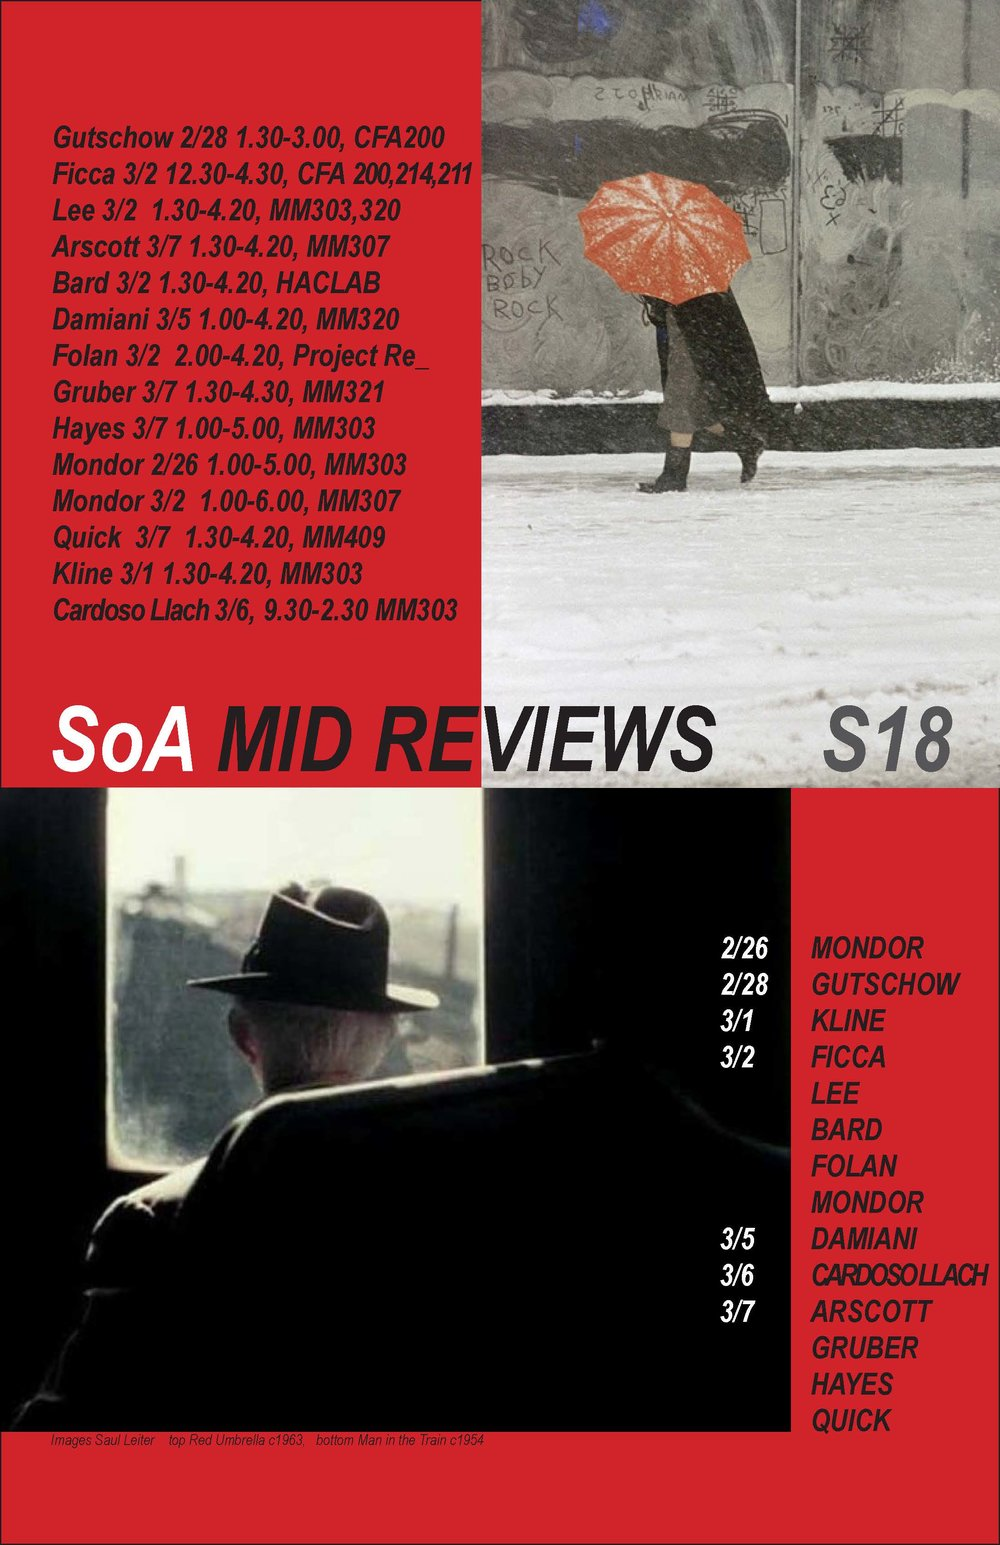 S18 midreviews 2_20.jpg